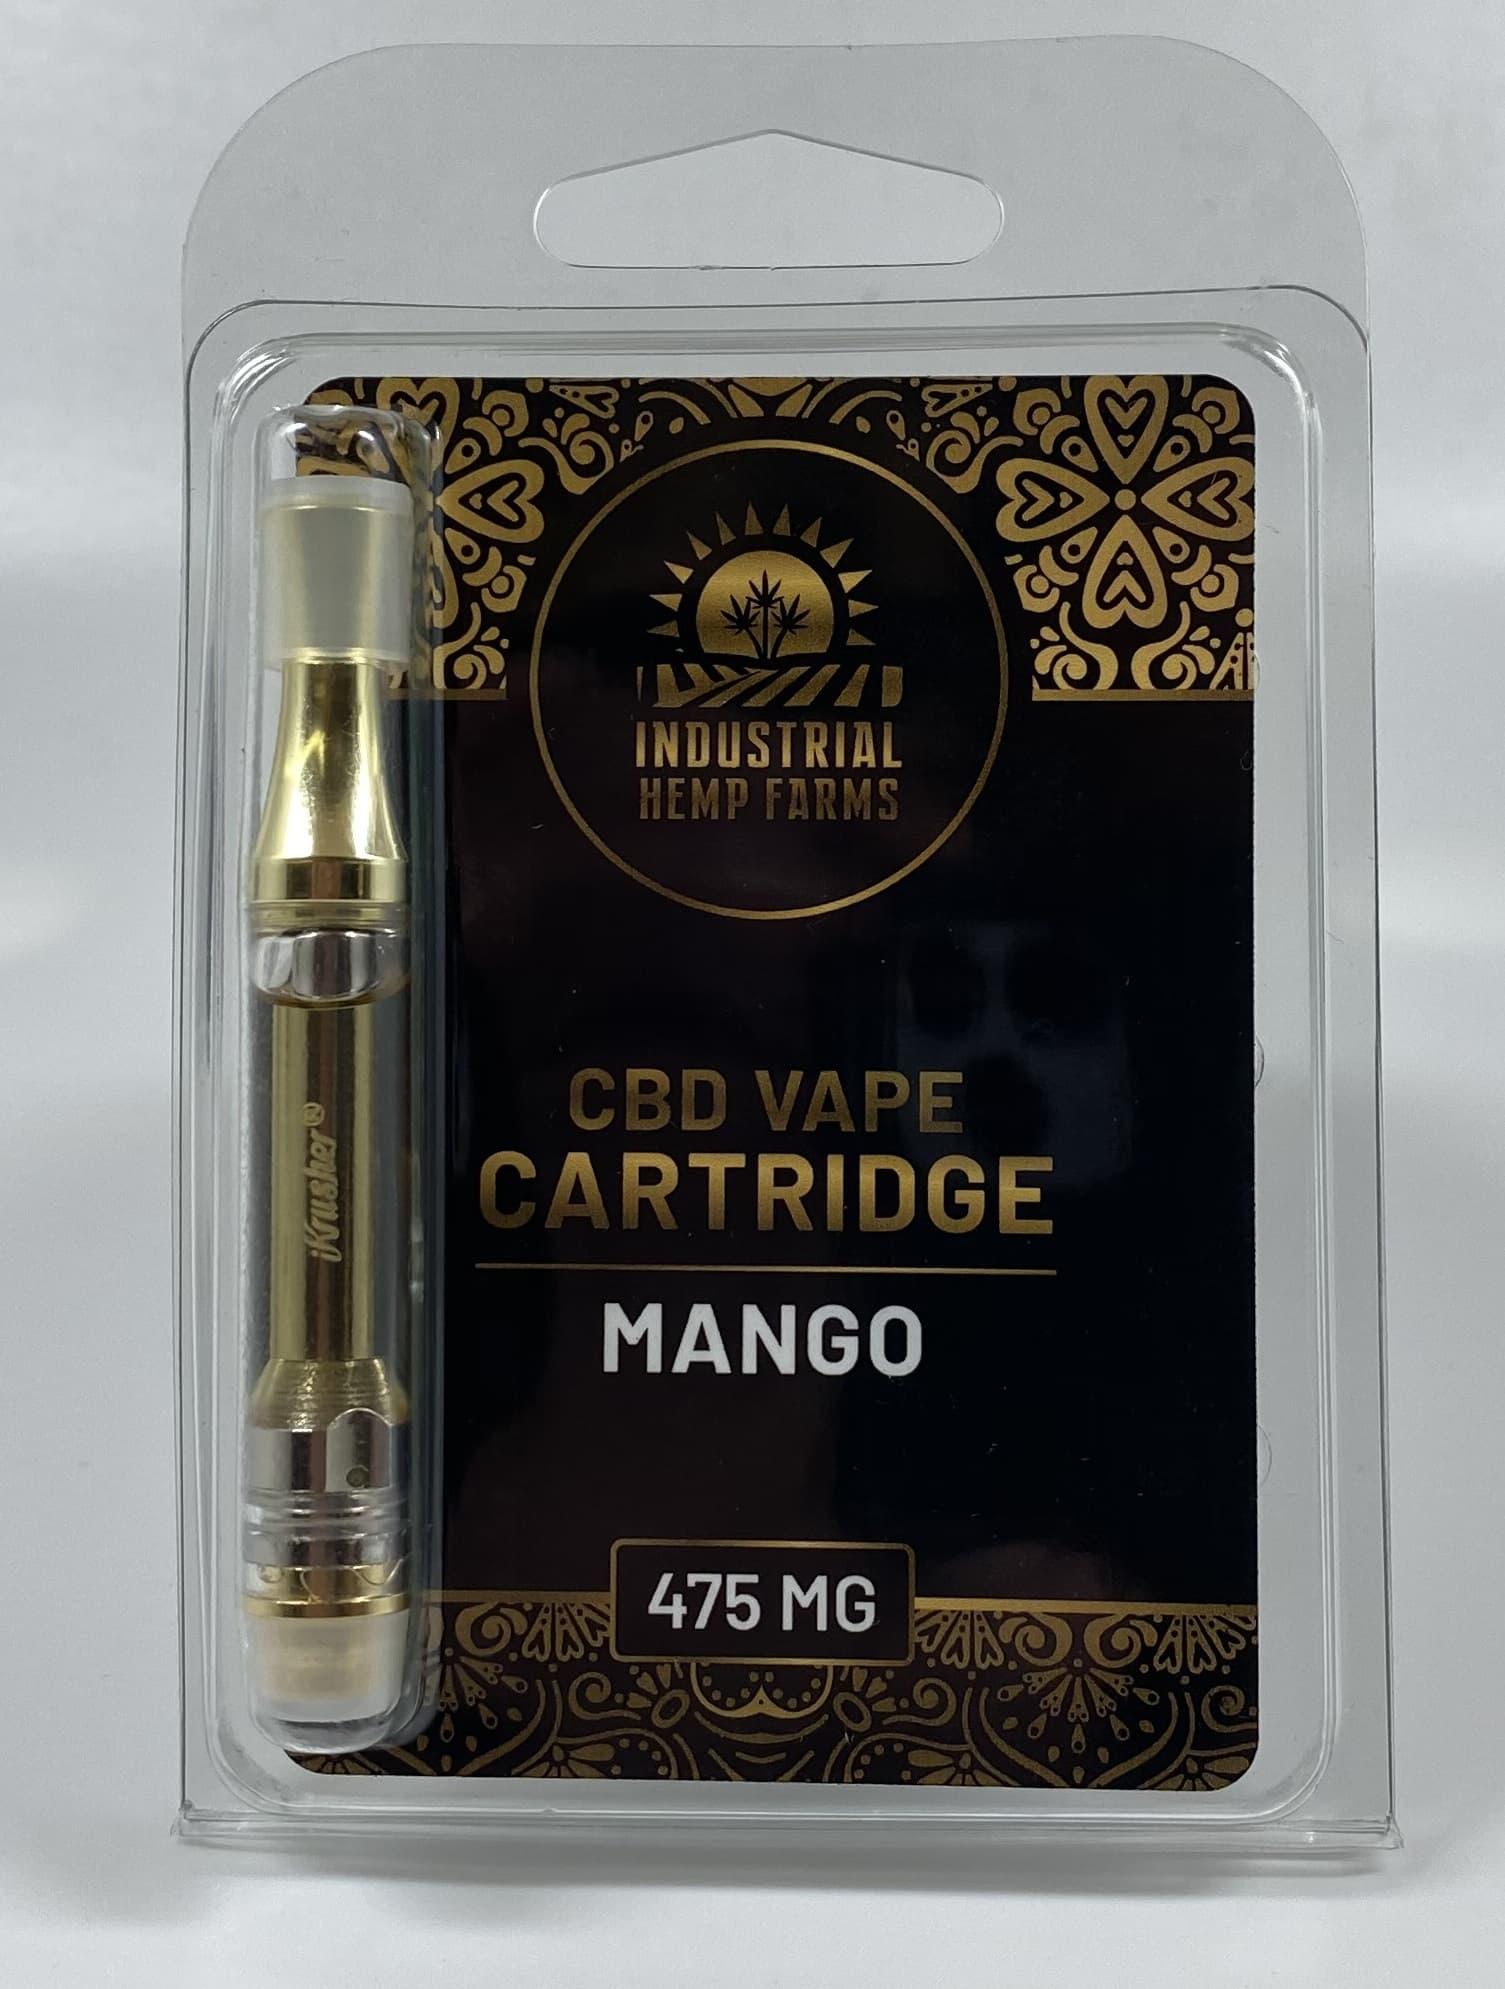 mango cbd vape pen cartridge for sale